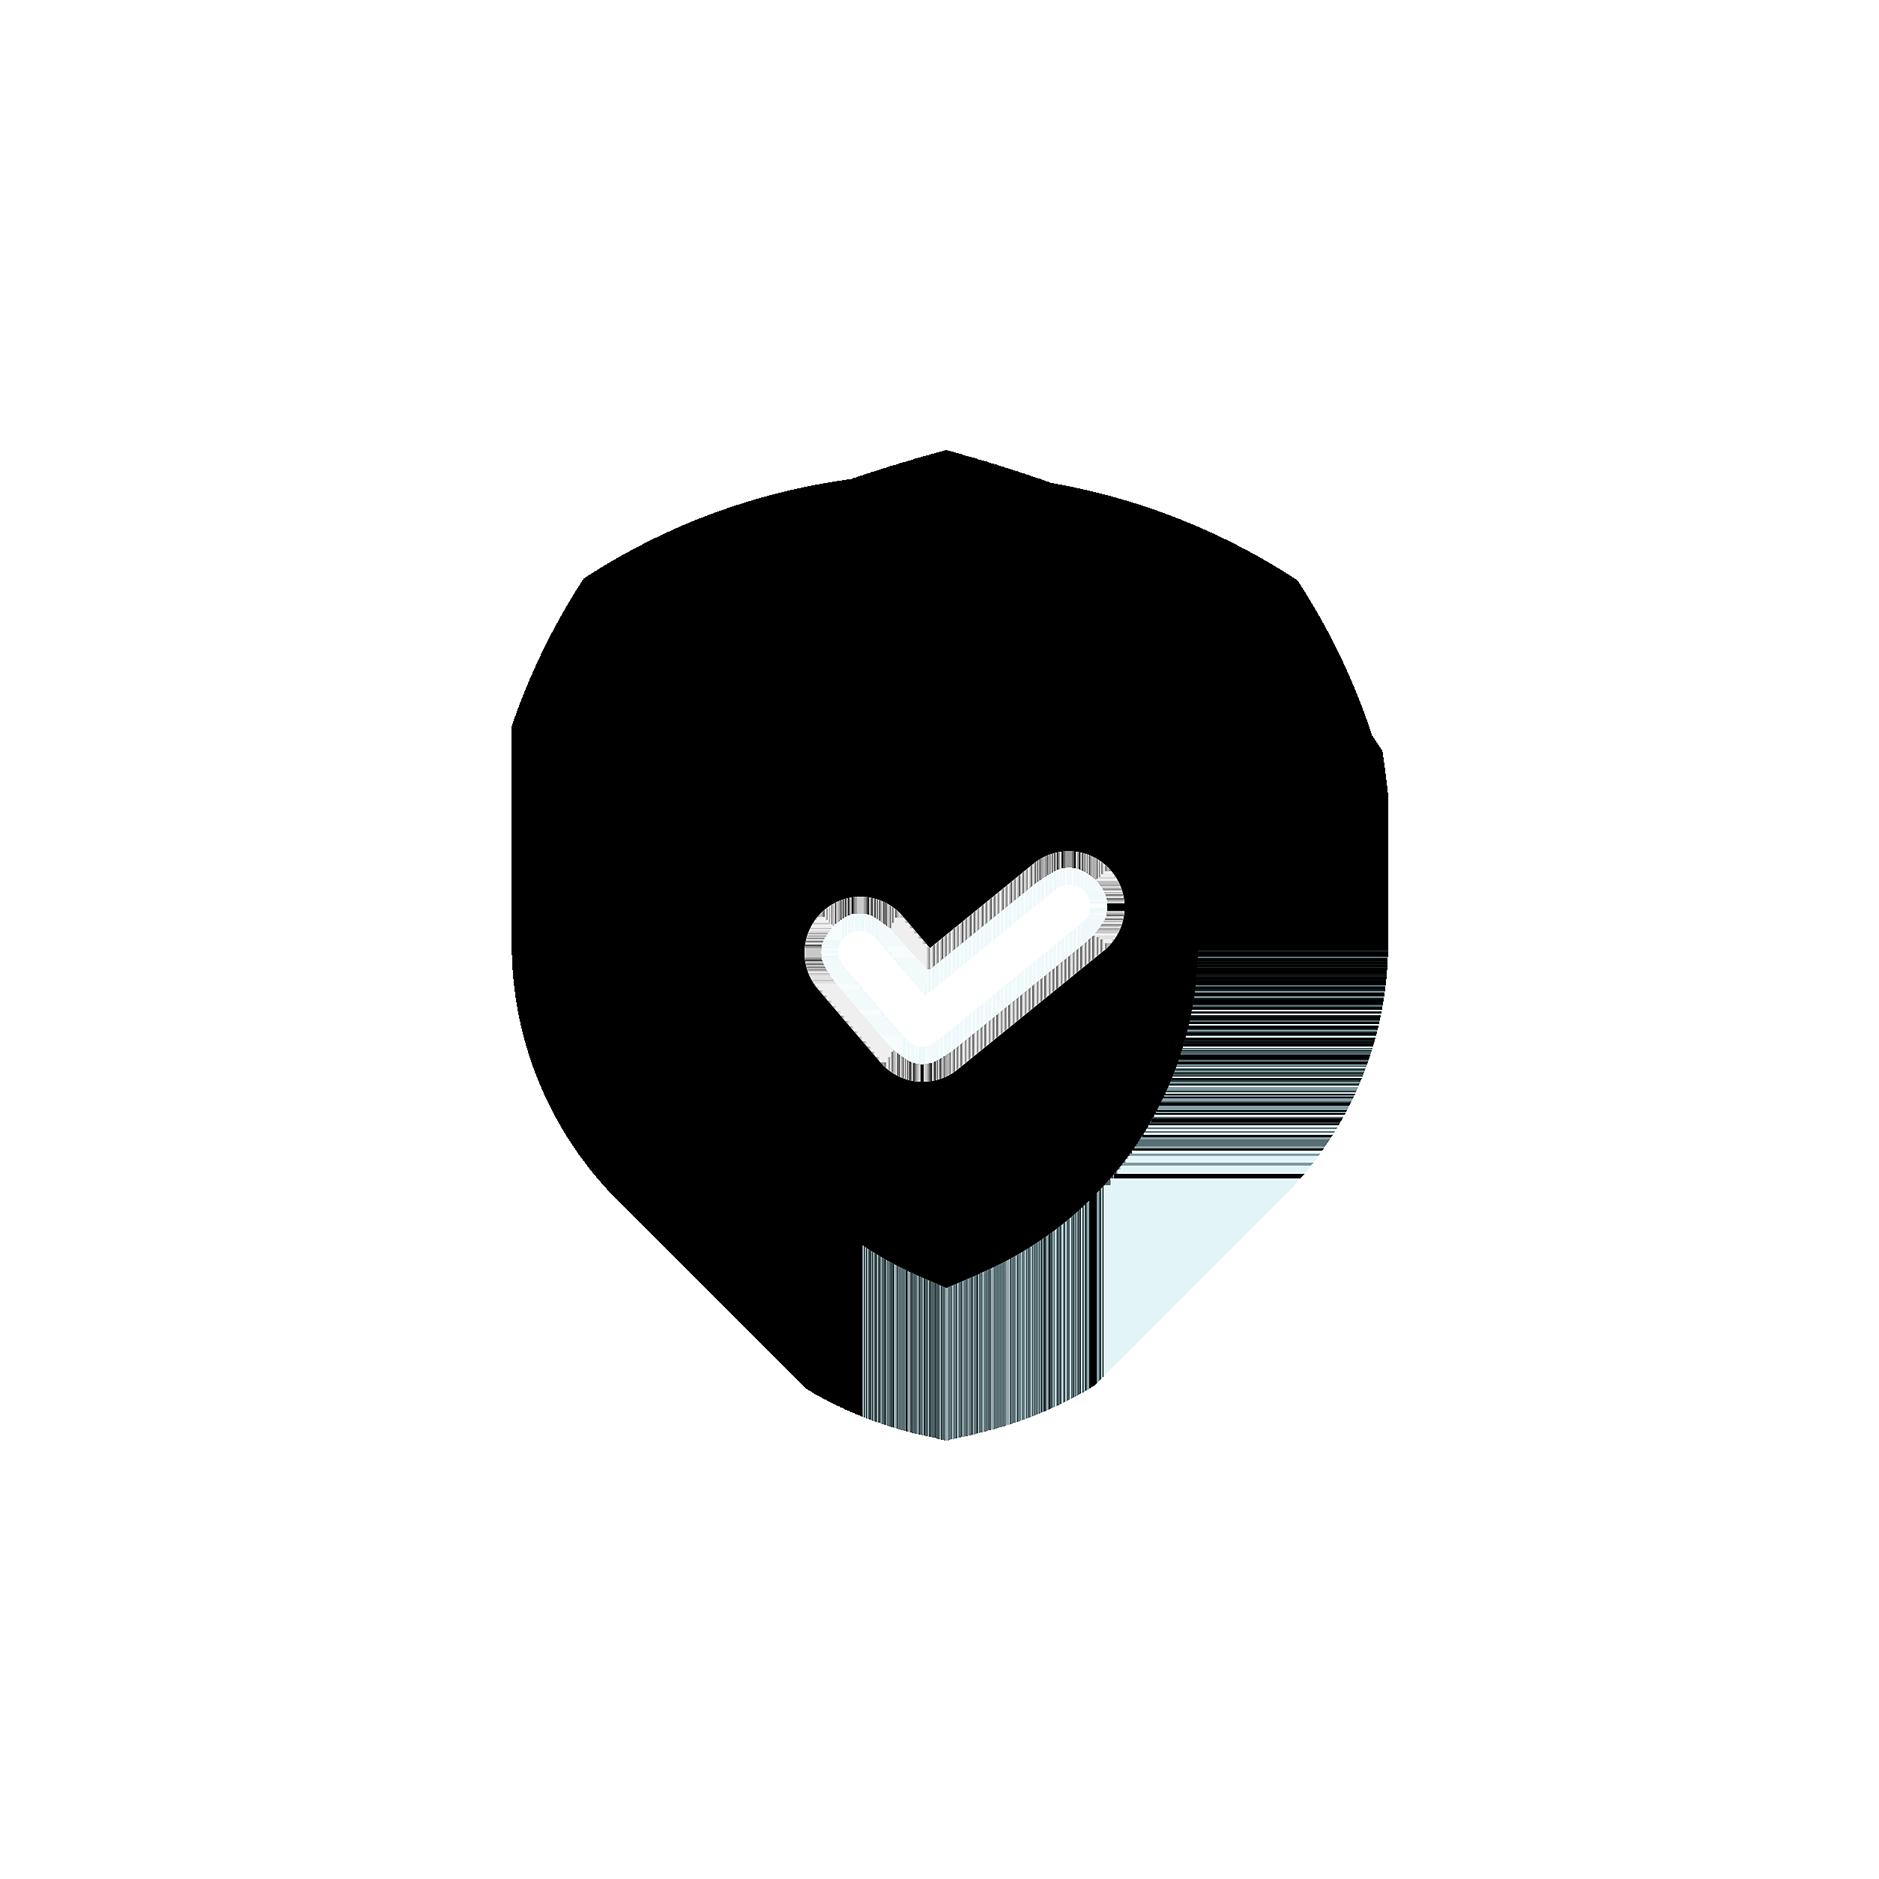 AS-icon_verzekering